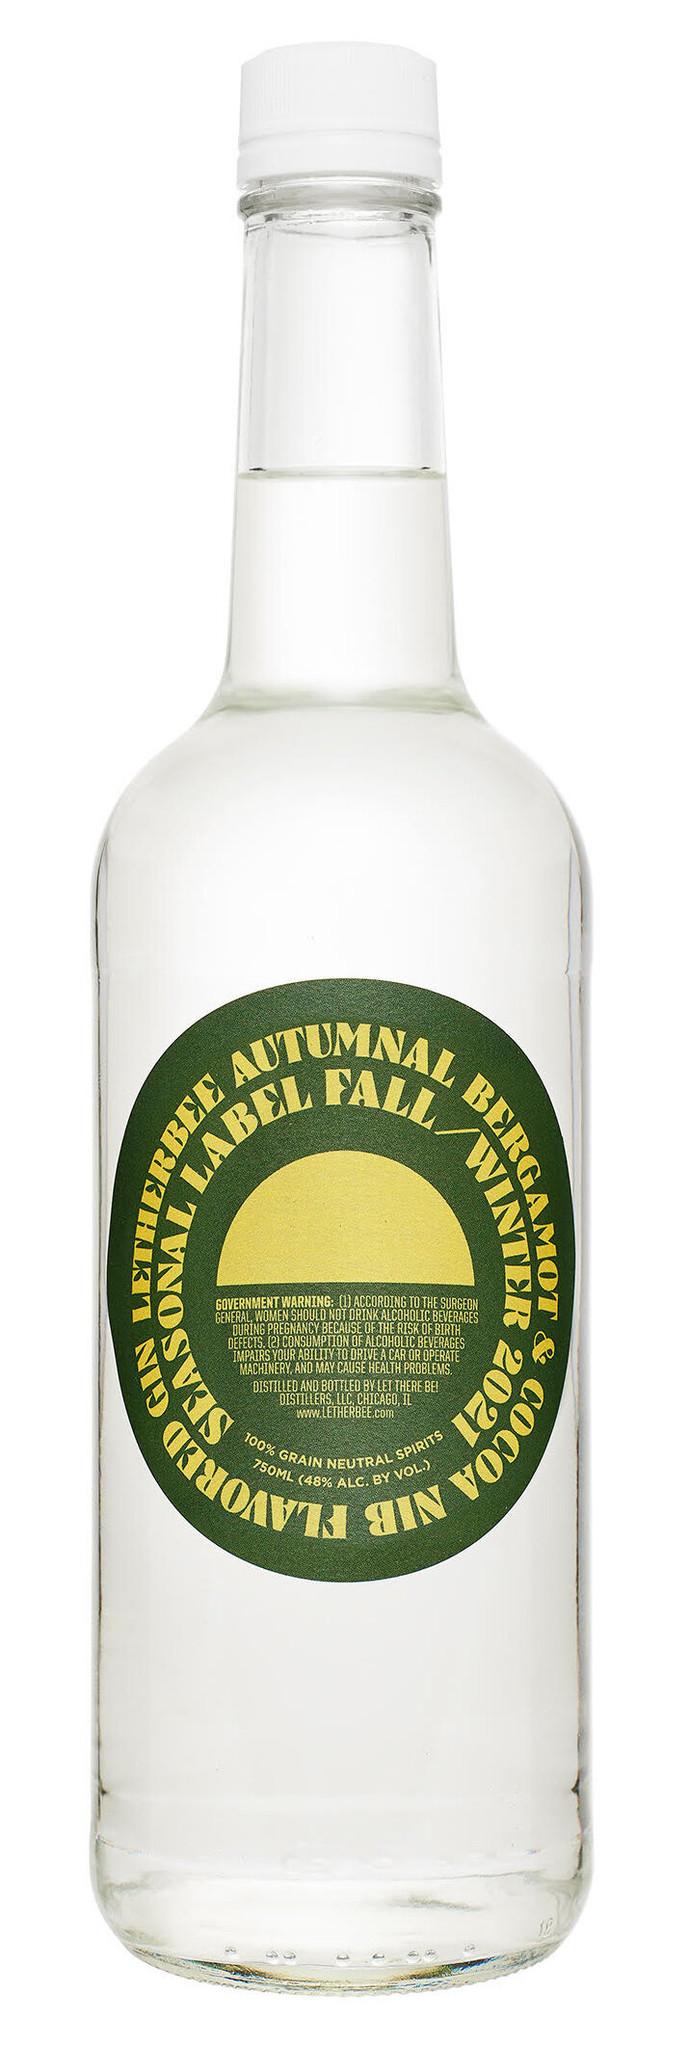 Letherbee Autumnal 2021 Limited Edition Bergamot & Cocoa Nib Gin  750ml